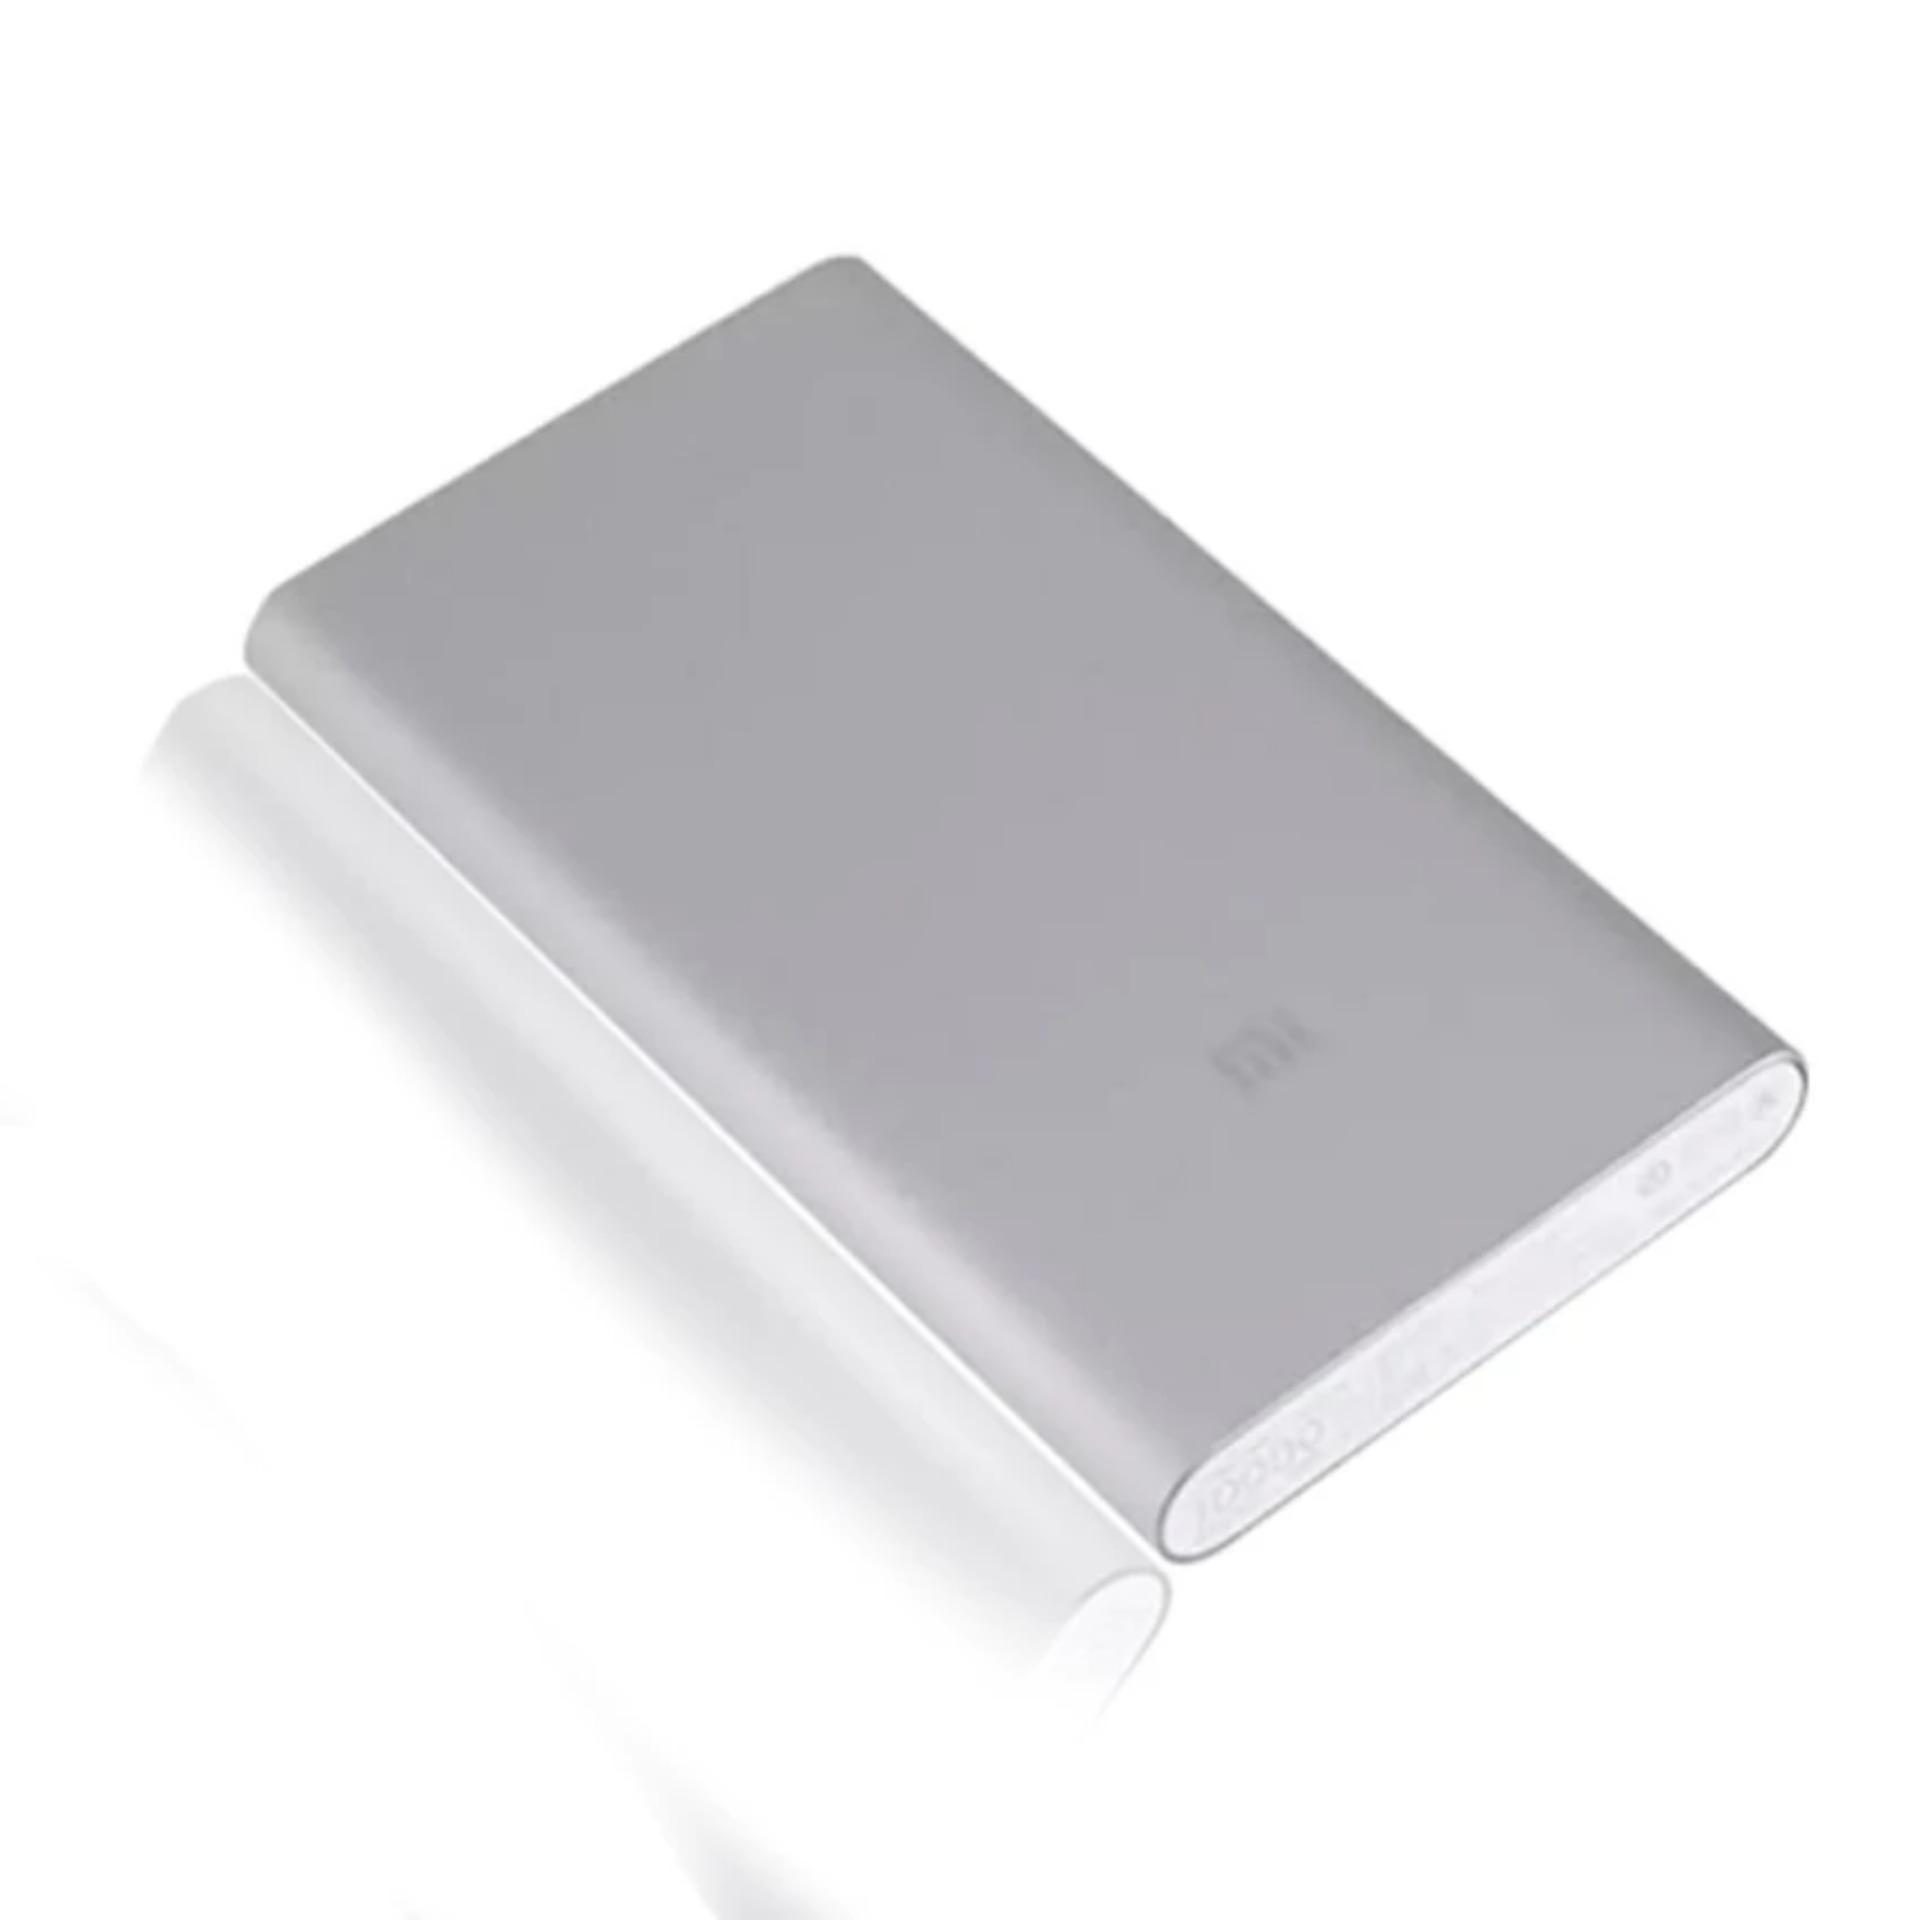 Philippines Xiaomi Mi 10000mah V2 Power Bank Silver Hot Deals Powerbank 2 Black